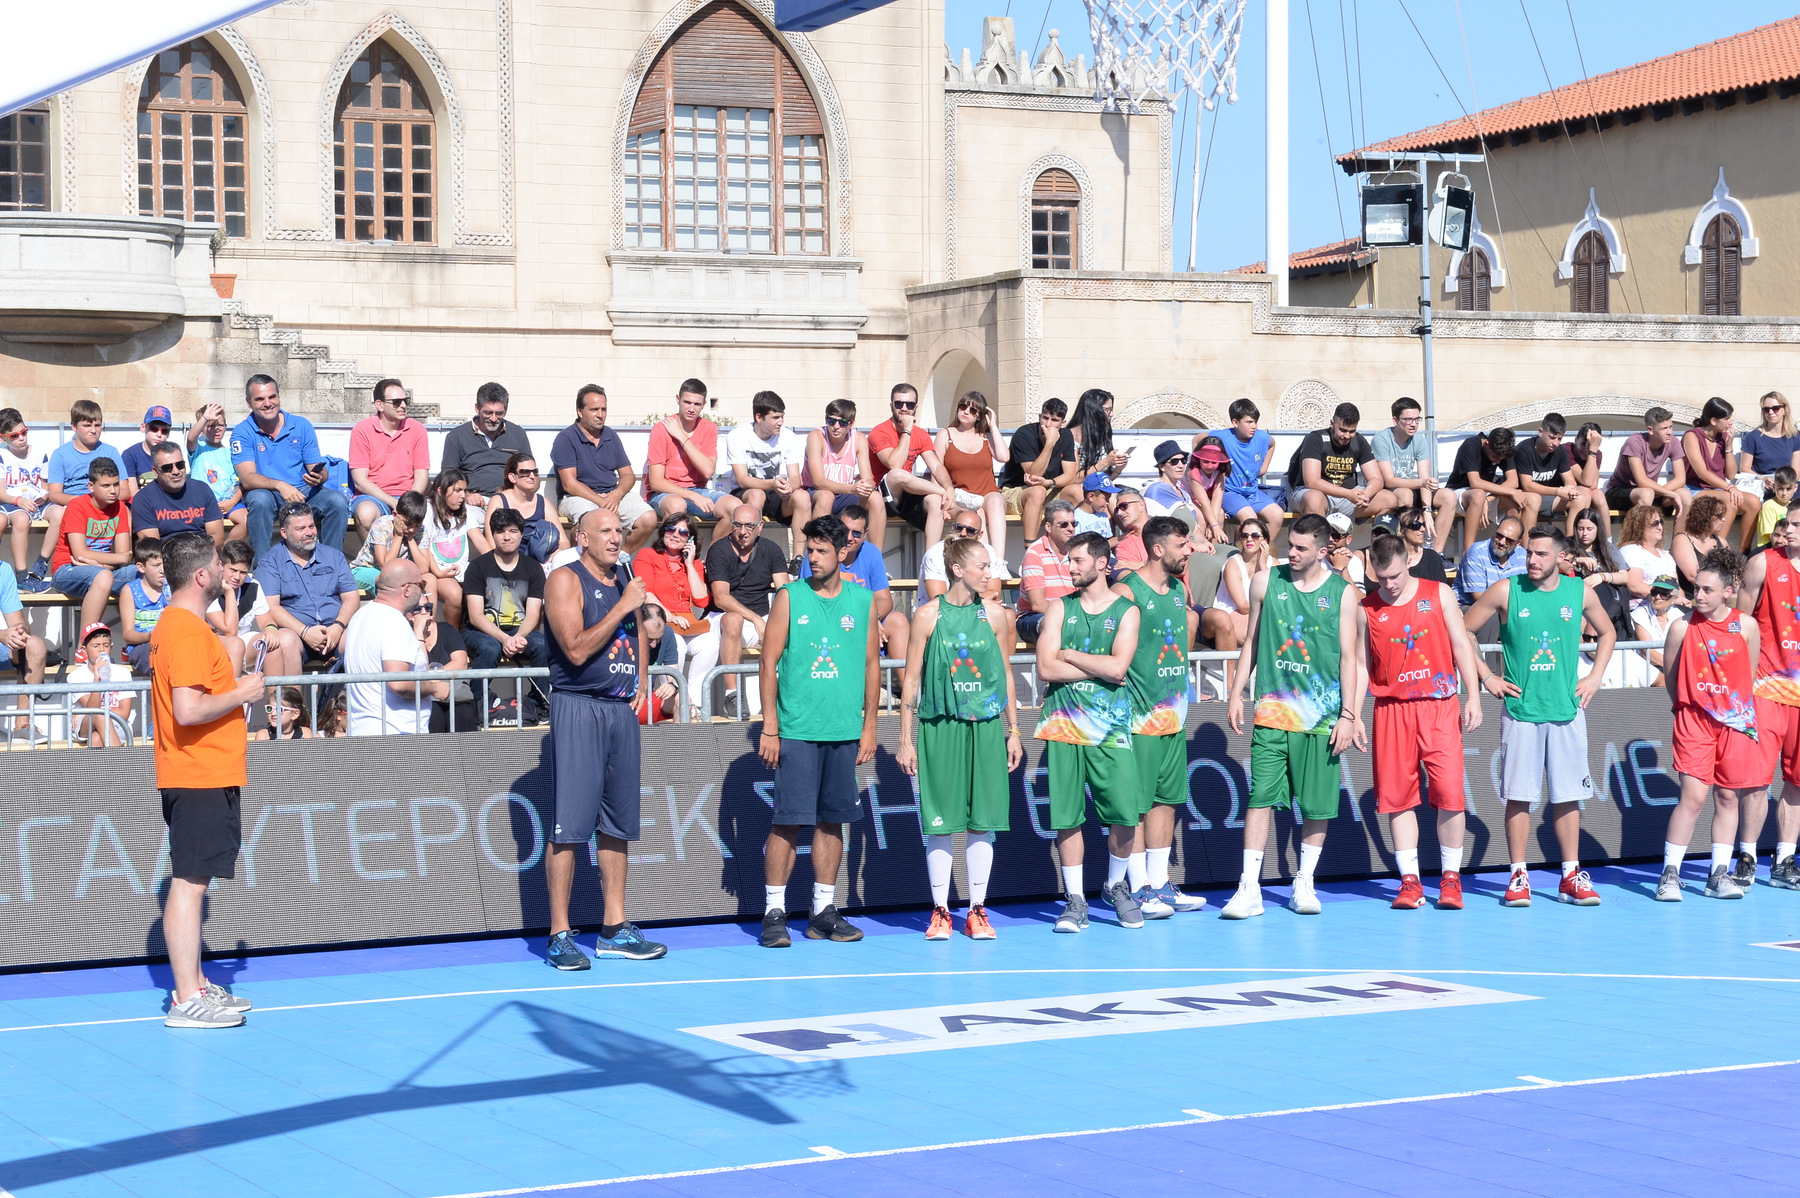 GalisBasketball 3on3: Ο Ντορόν Τζάμσι τίμησε τον Νίκο Γκάλη και έπαιξε μπάσκετ μπροστά στο κοινό της Ρόδου! (videos)